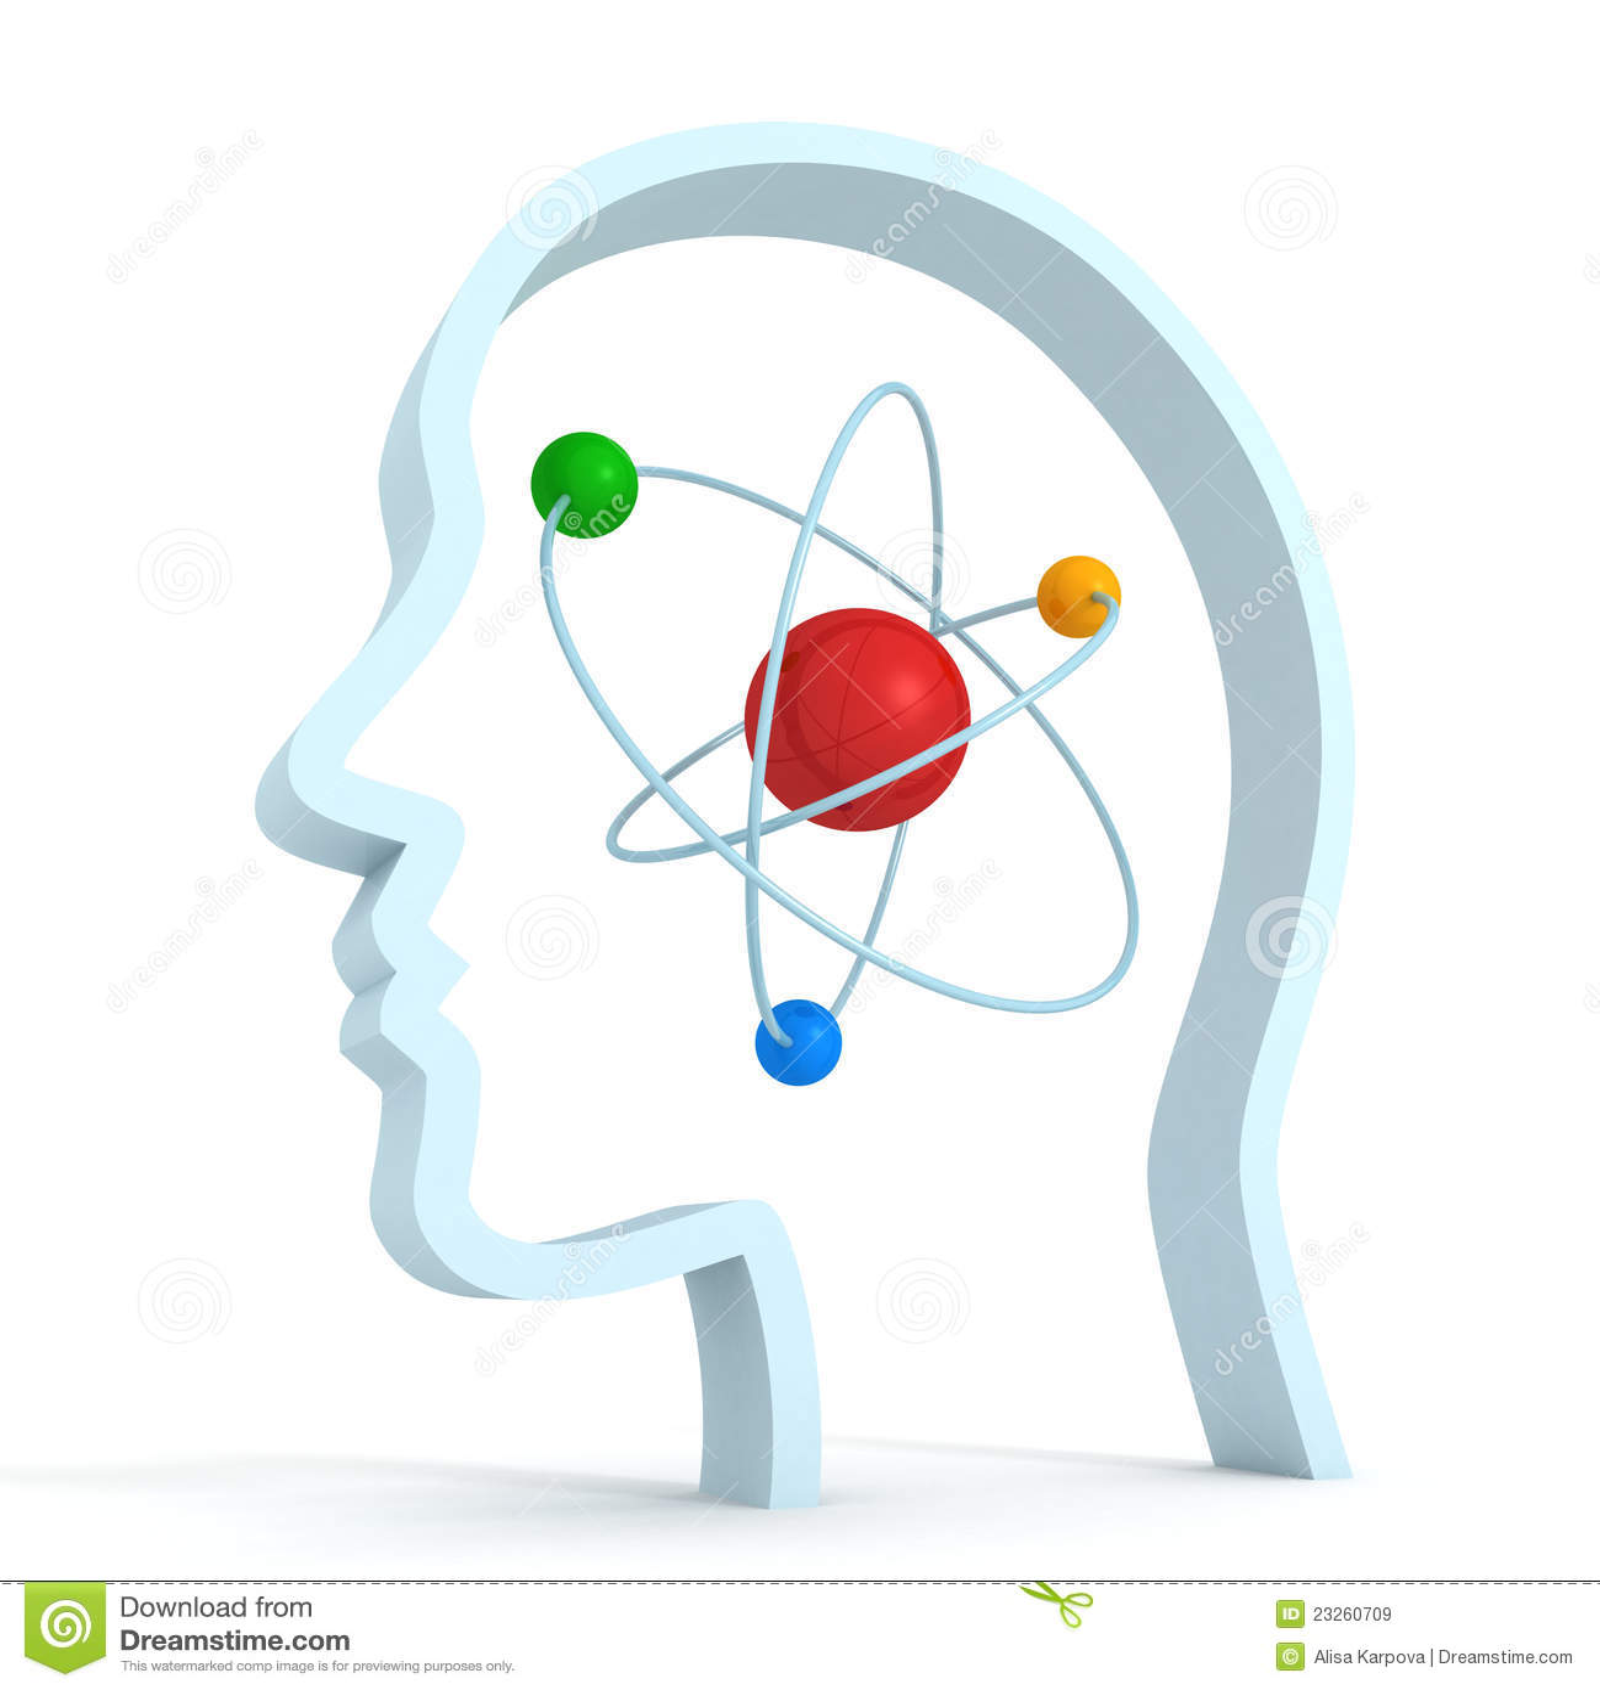 atom molecule science symbol brain human head royalty free Auguste Rodin The Thinker The Thinker Drawing